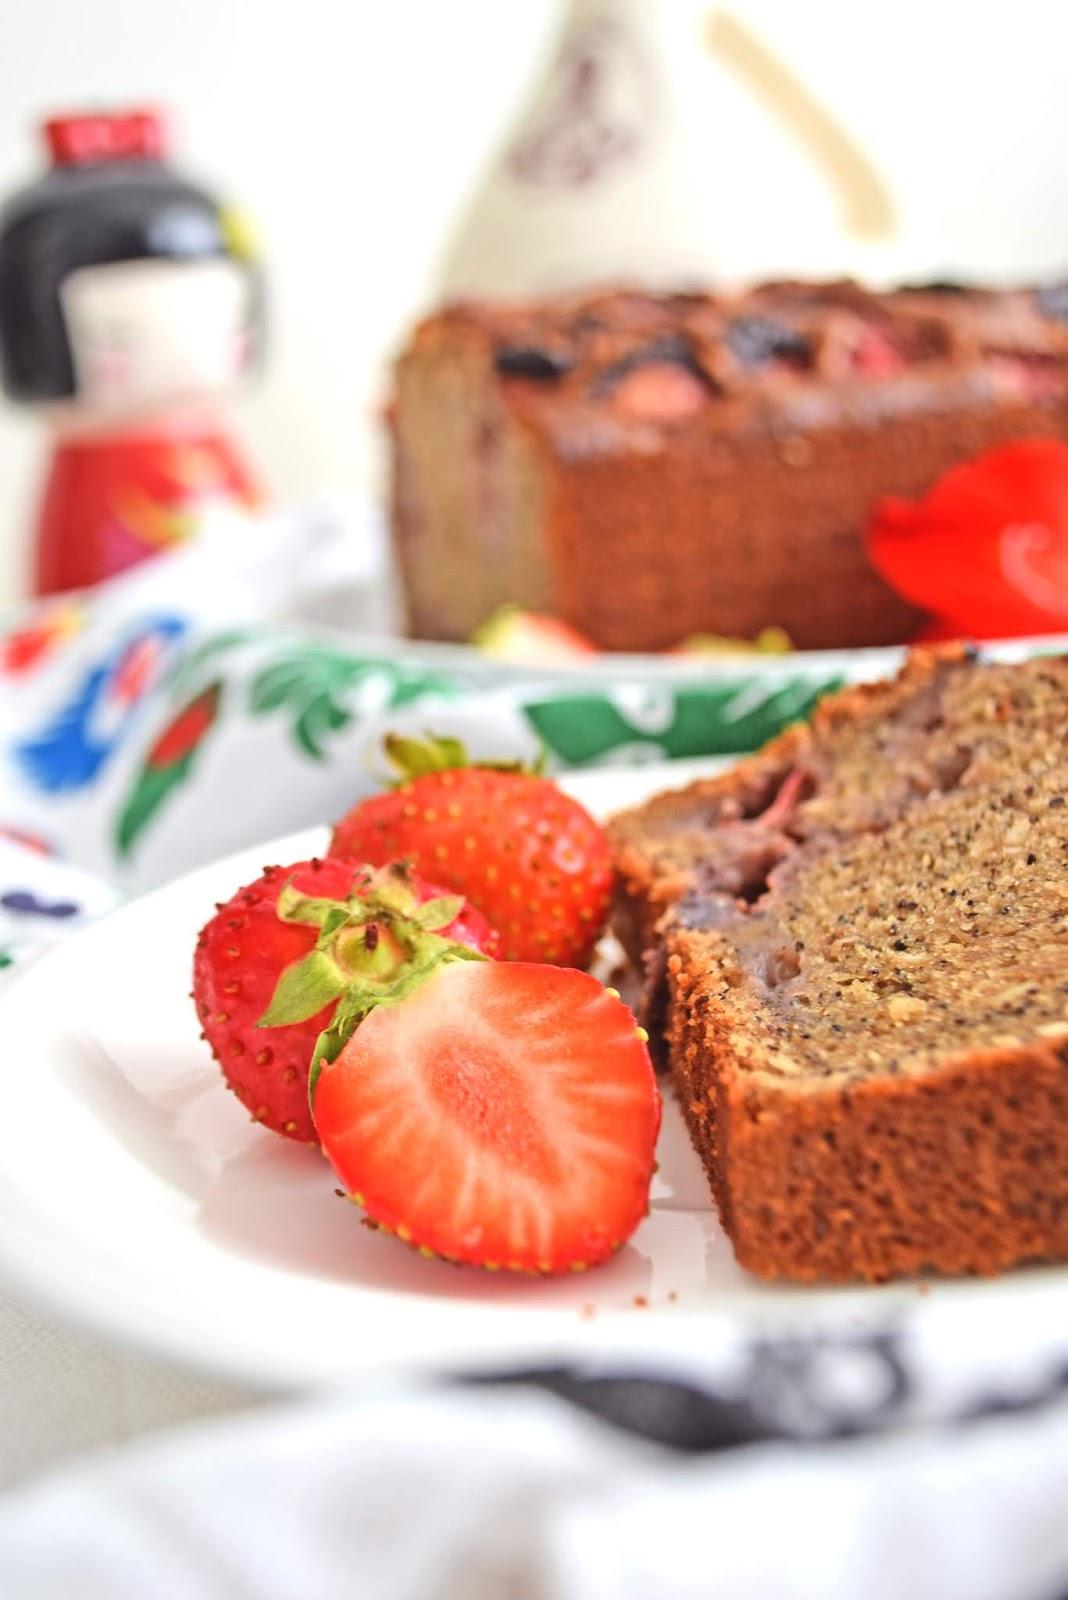 Vegan cake with strawberries